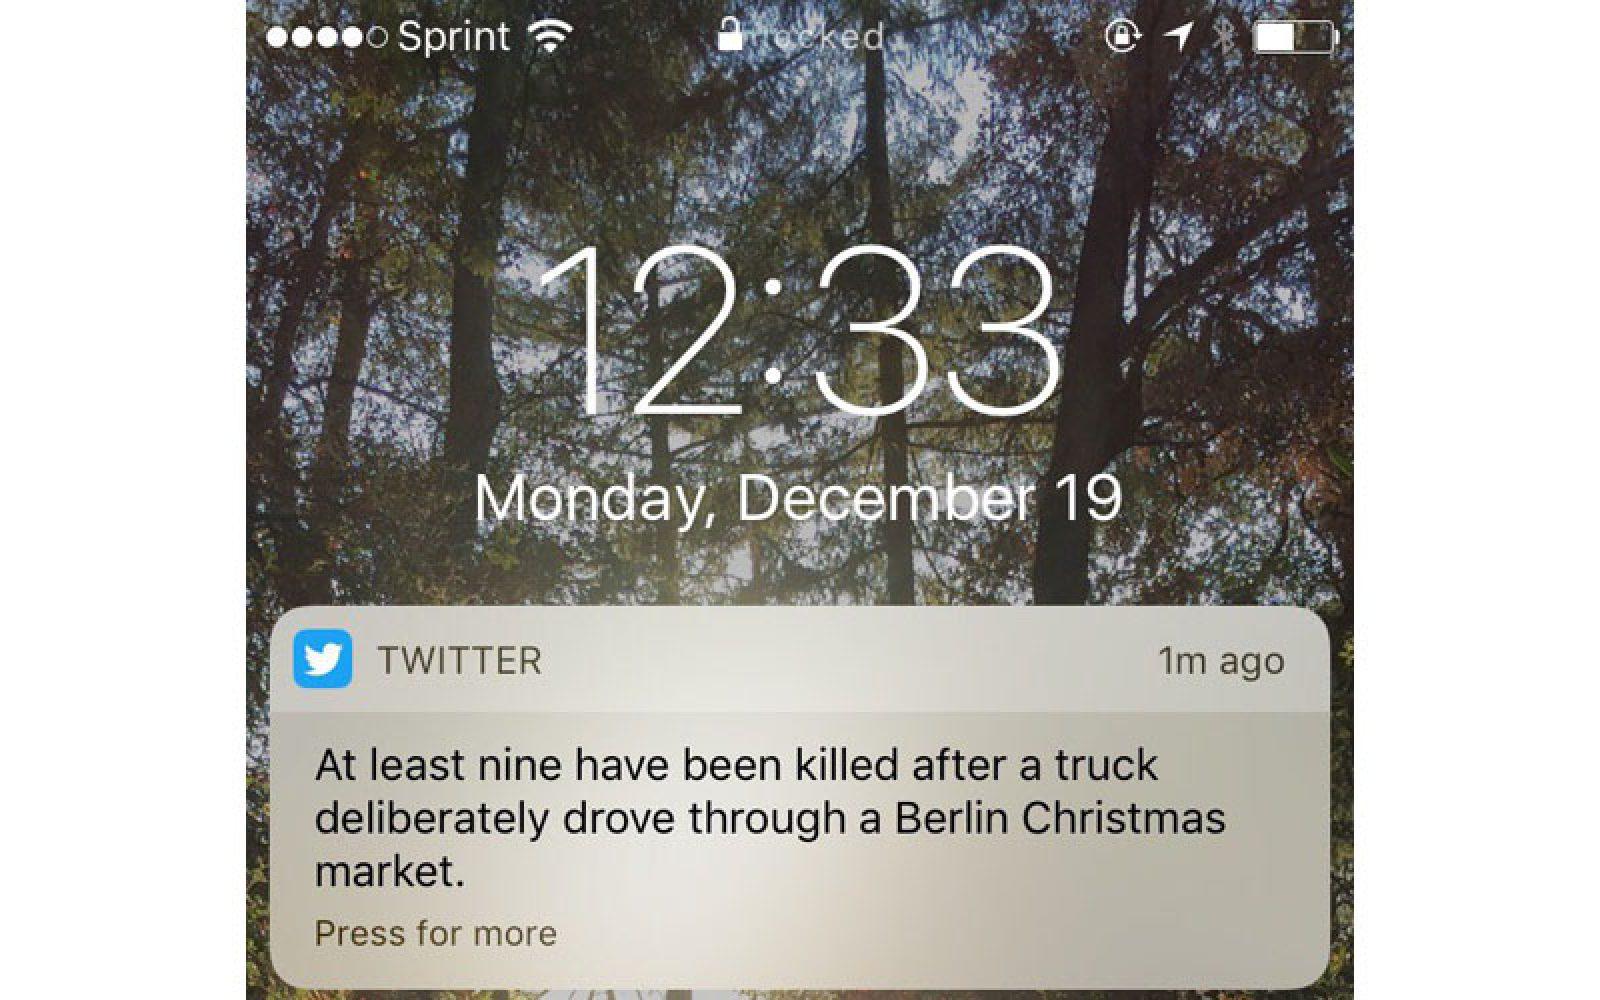 Twitter testing breaking news alerts in iOS app with Berlin